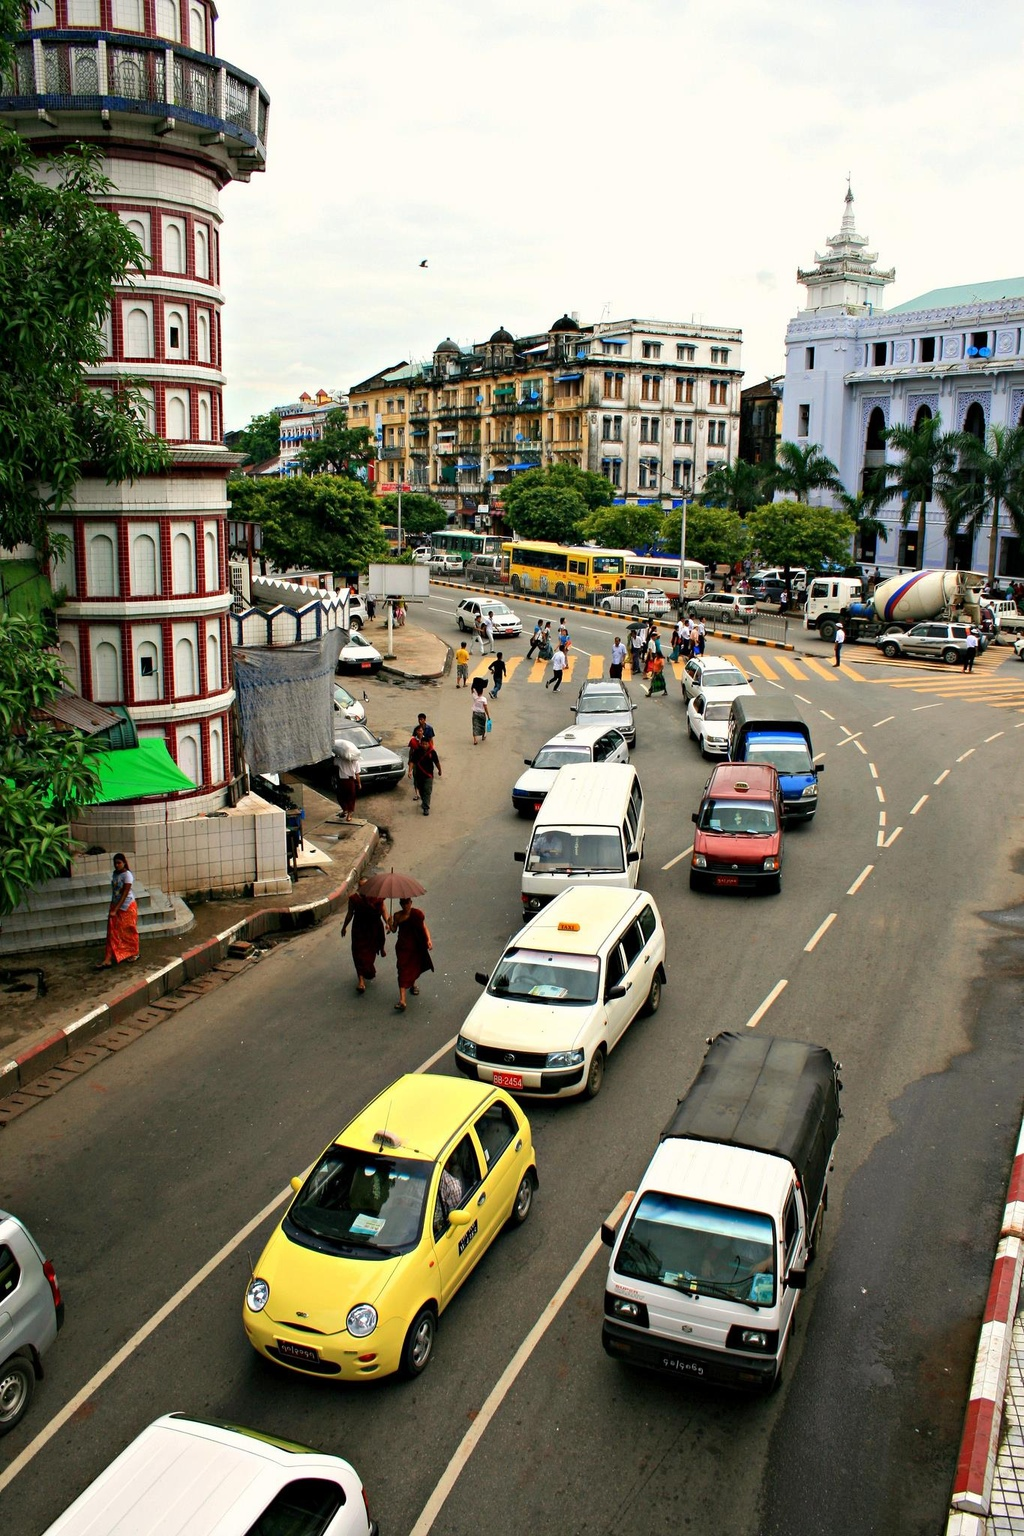 Duong pho Myanmar ach tac, tran ngap xe hoi sau 16 nam cam xe may hinh anh 2